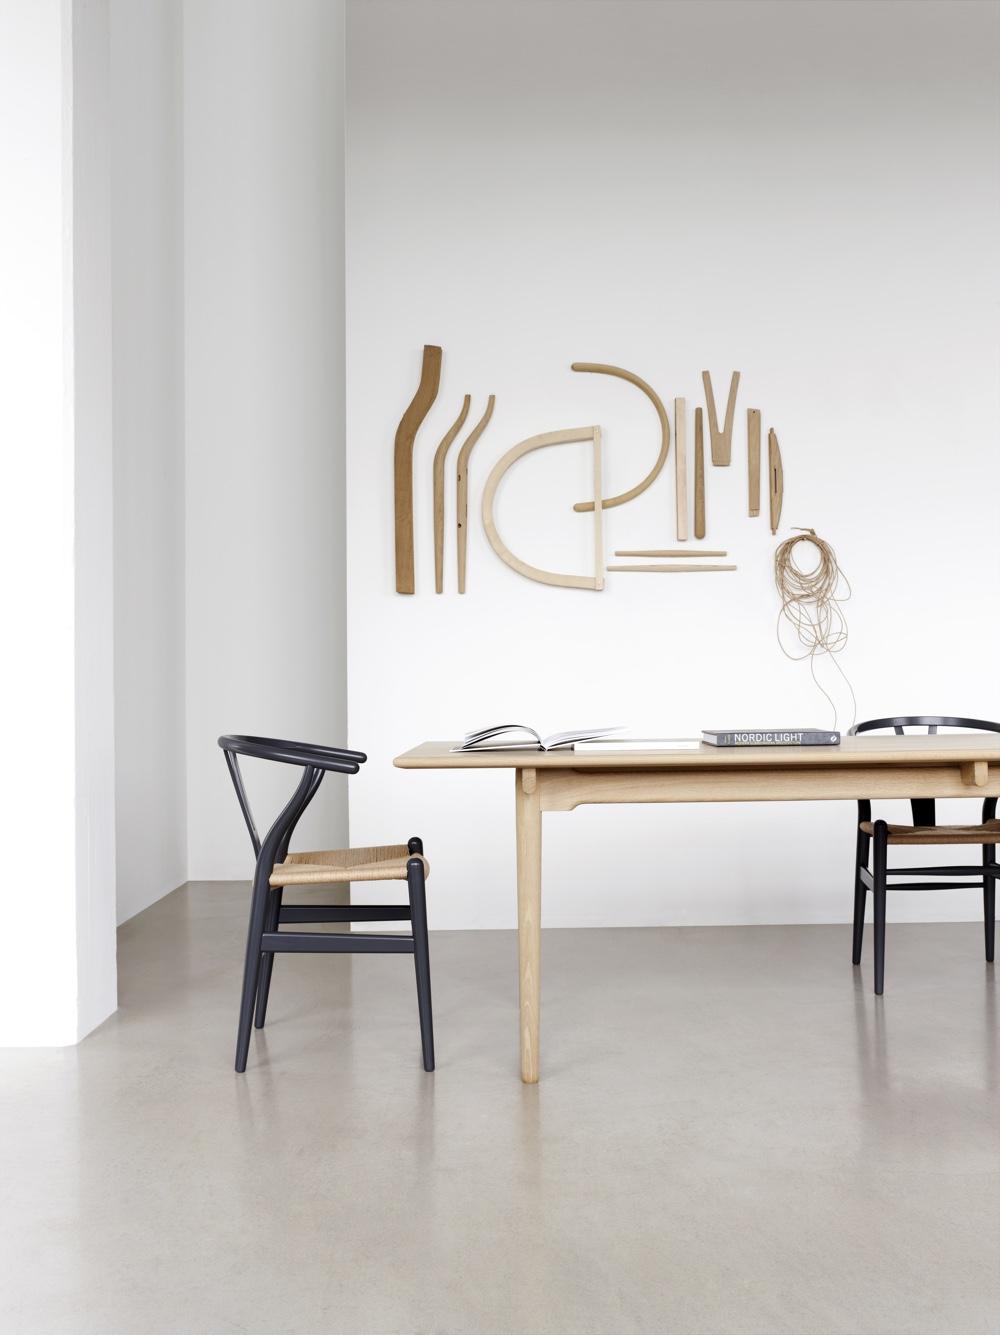 Wishbone Chair, designed in 1949 by Hans J. Wegner. Image © Carl Hansen & Søn.